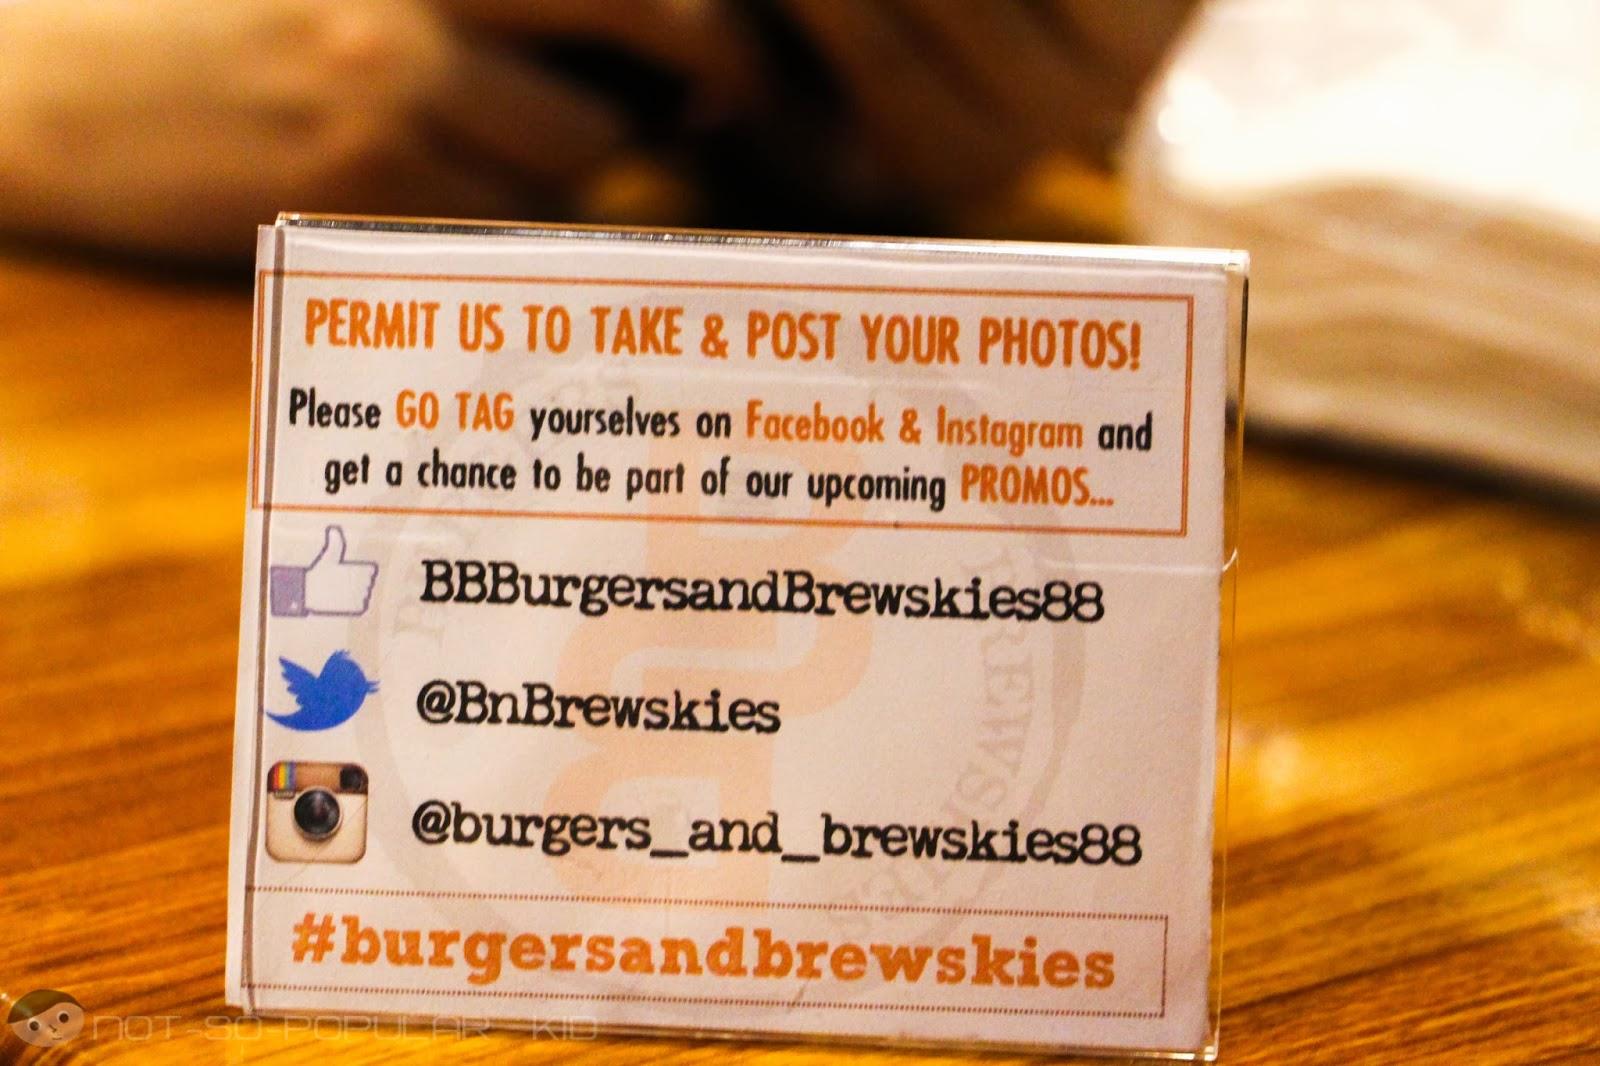 Burgers and Brewskies Social Media Accounts